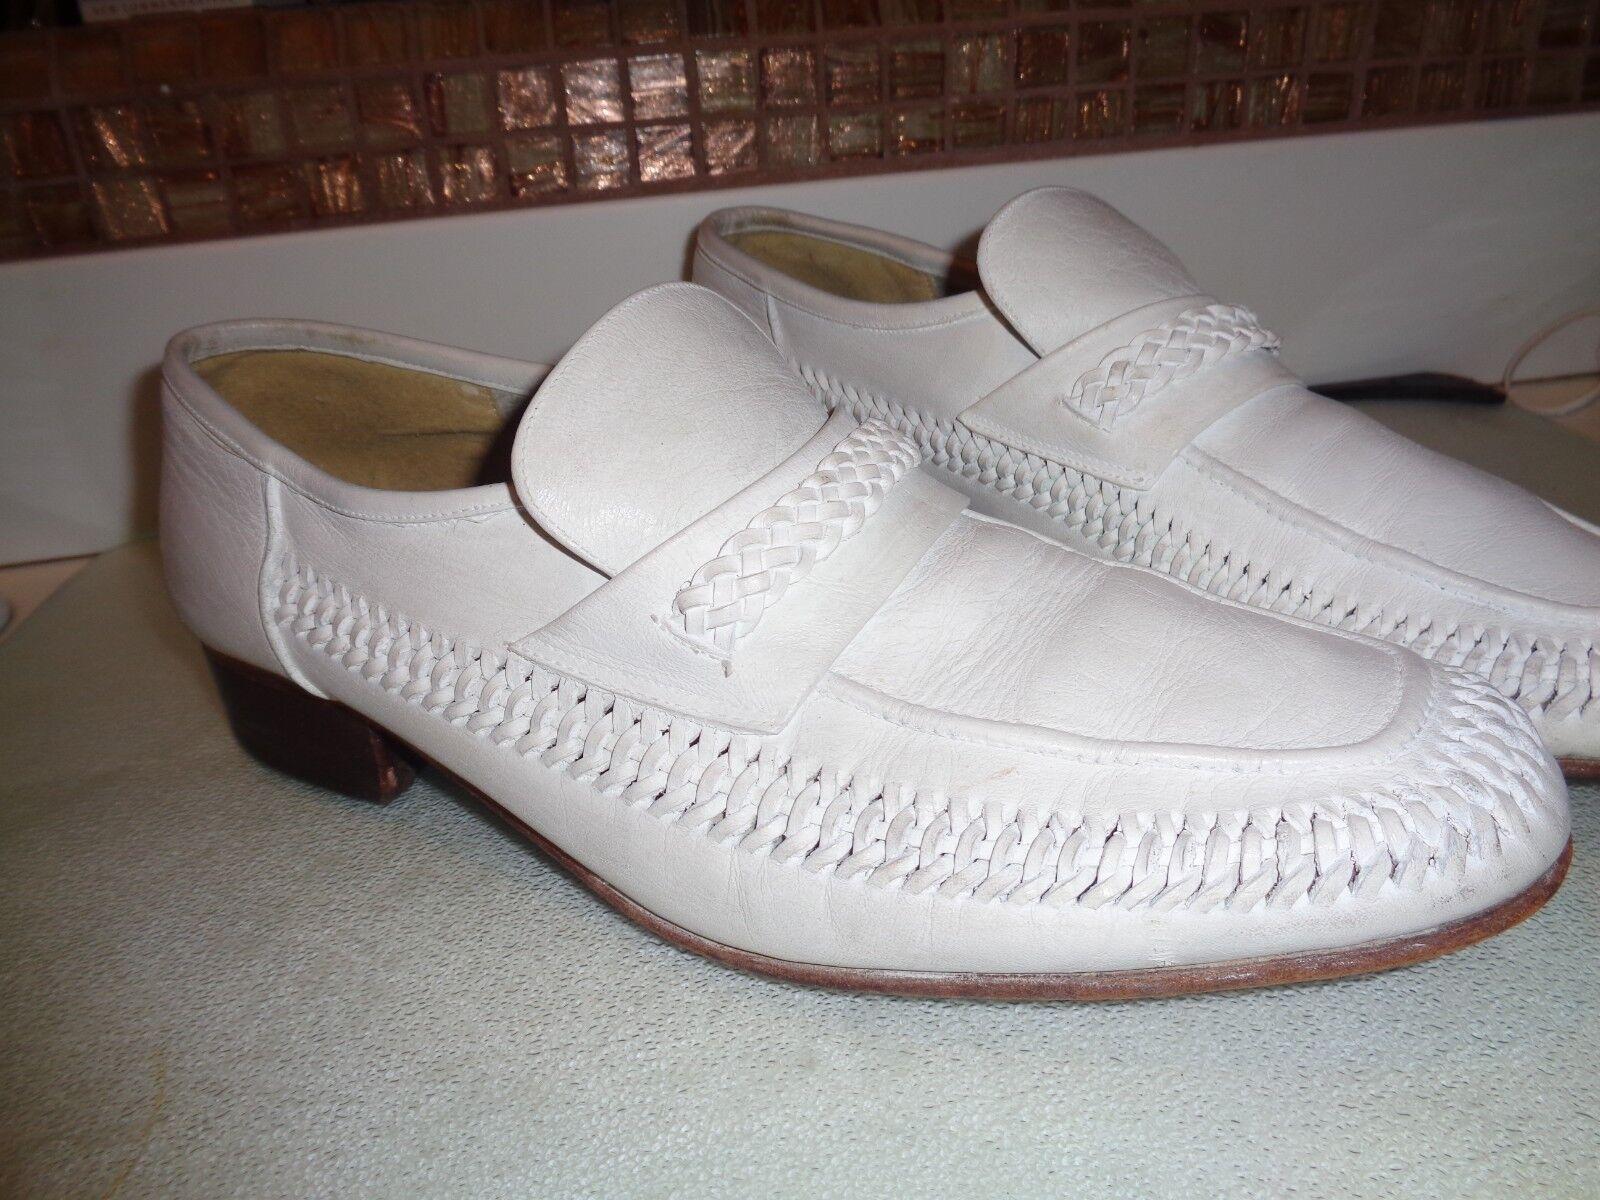 Mens Slip on White Shoes Cousin Eddie size 8.5